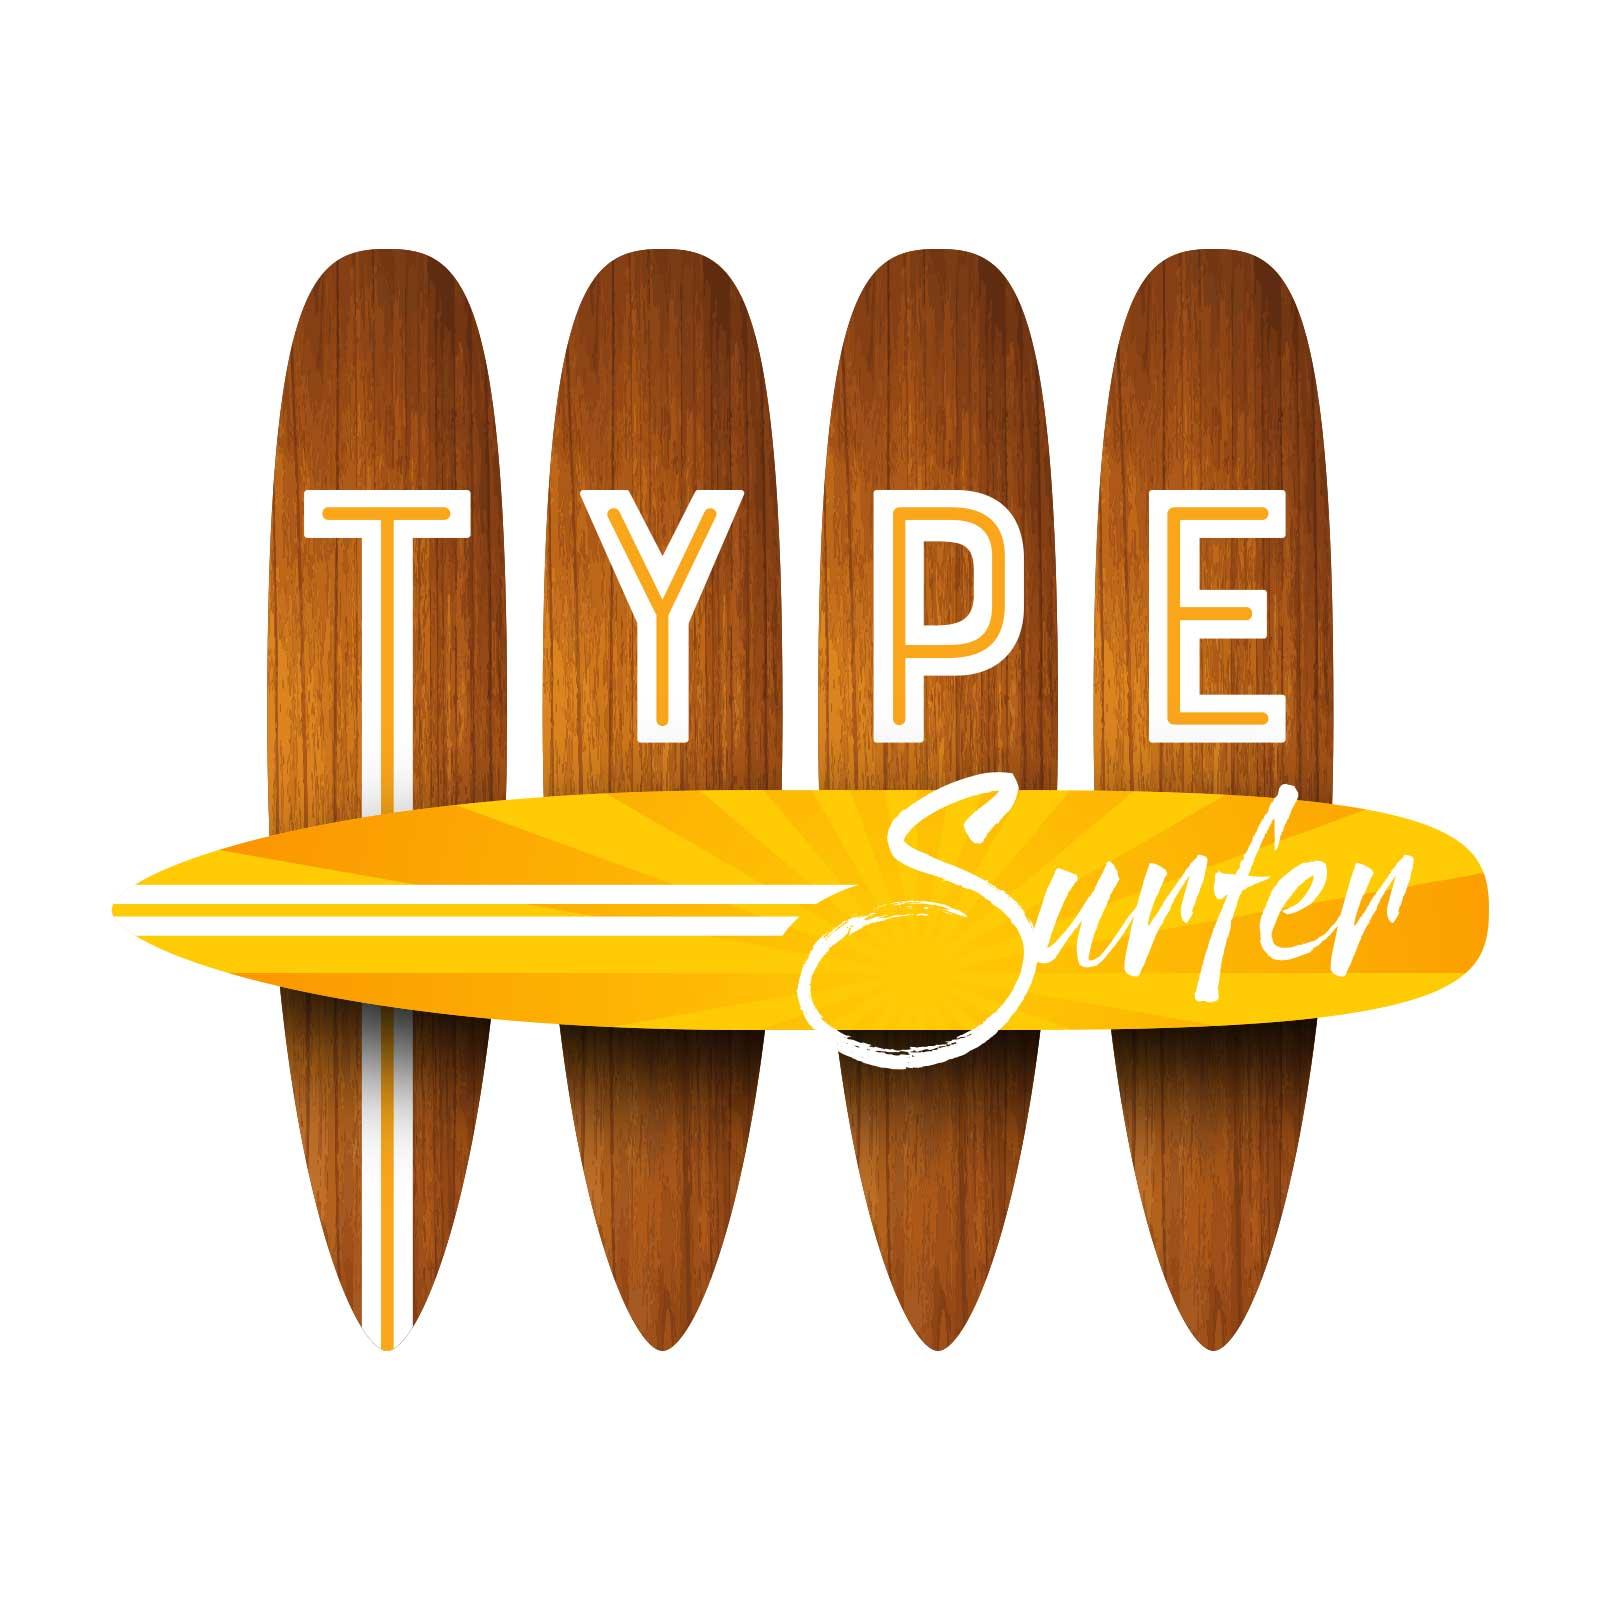 TYPEsurfer.jpg